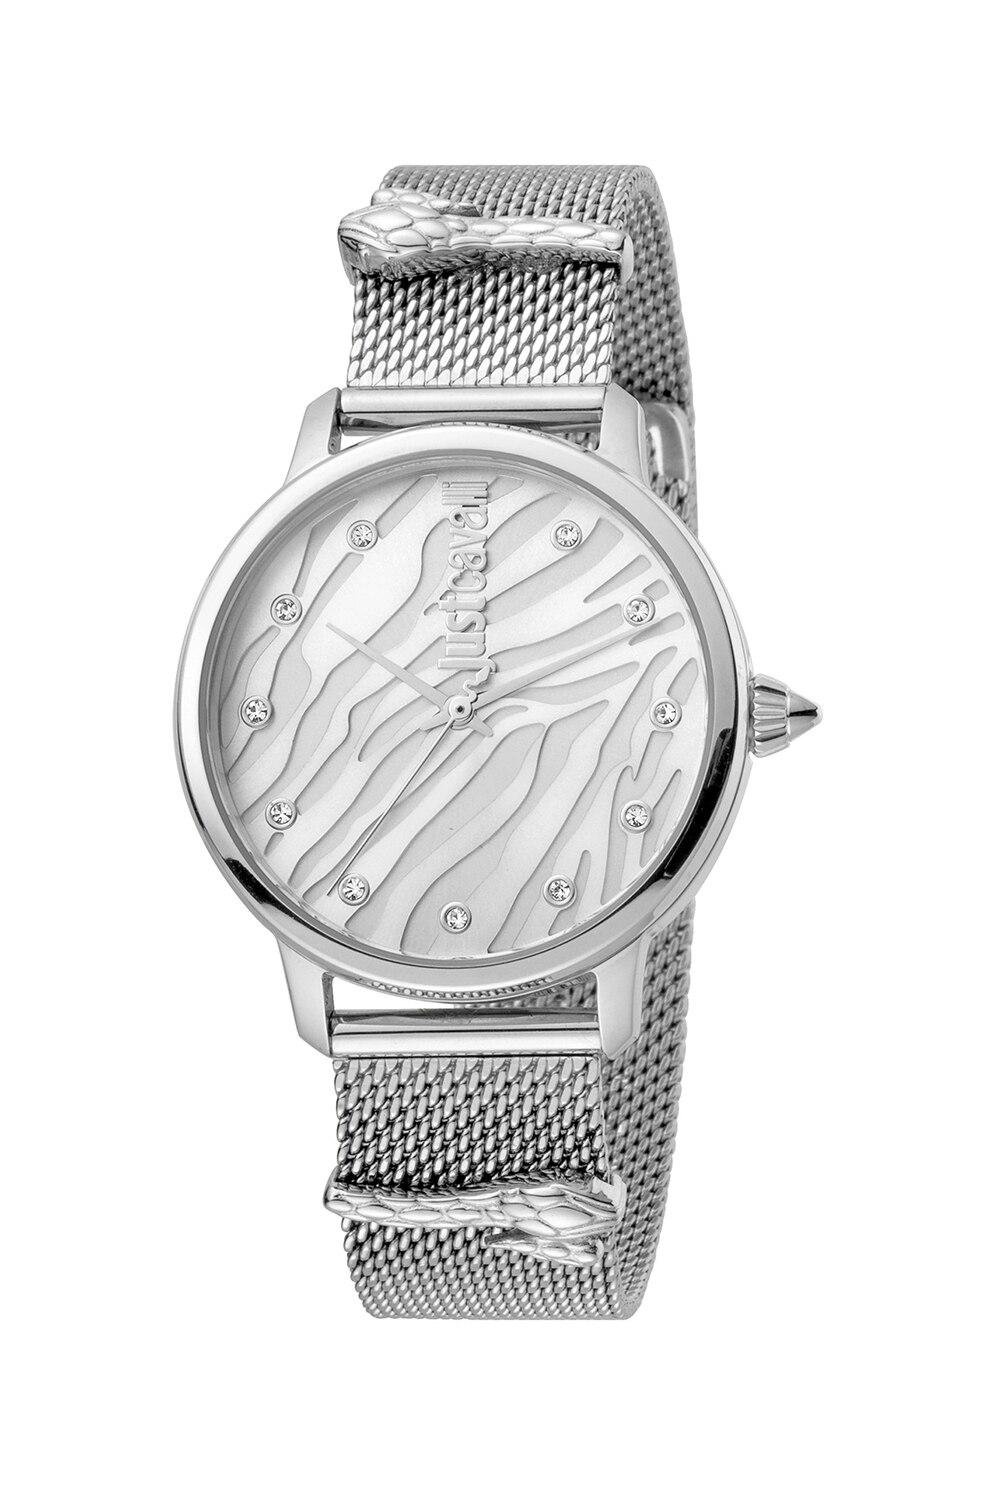 Fotografie JUST CAVALLI, Ceas din otel inoxidabil, decorat cu zirconia, Argintiu